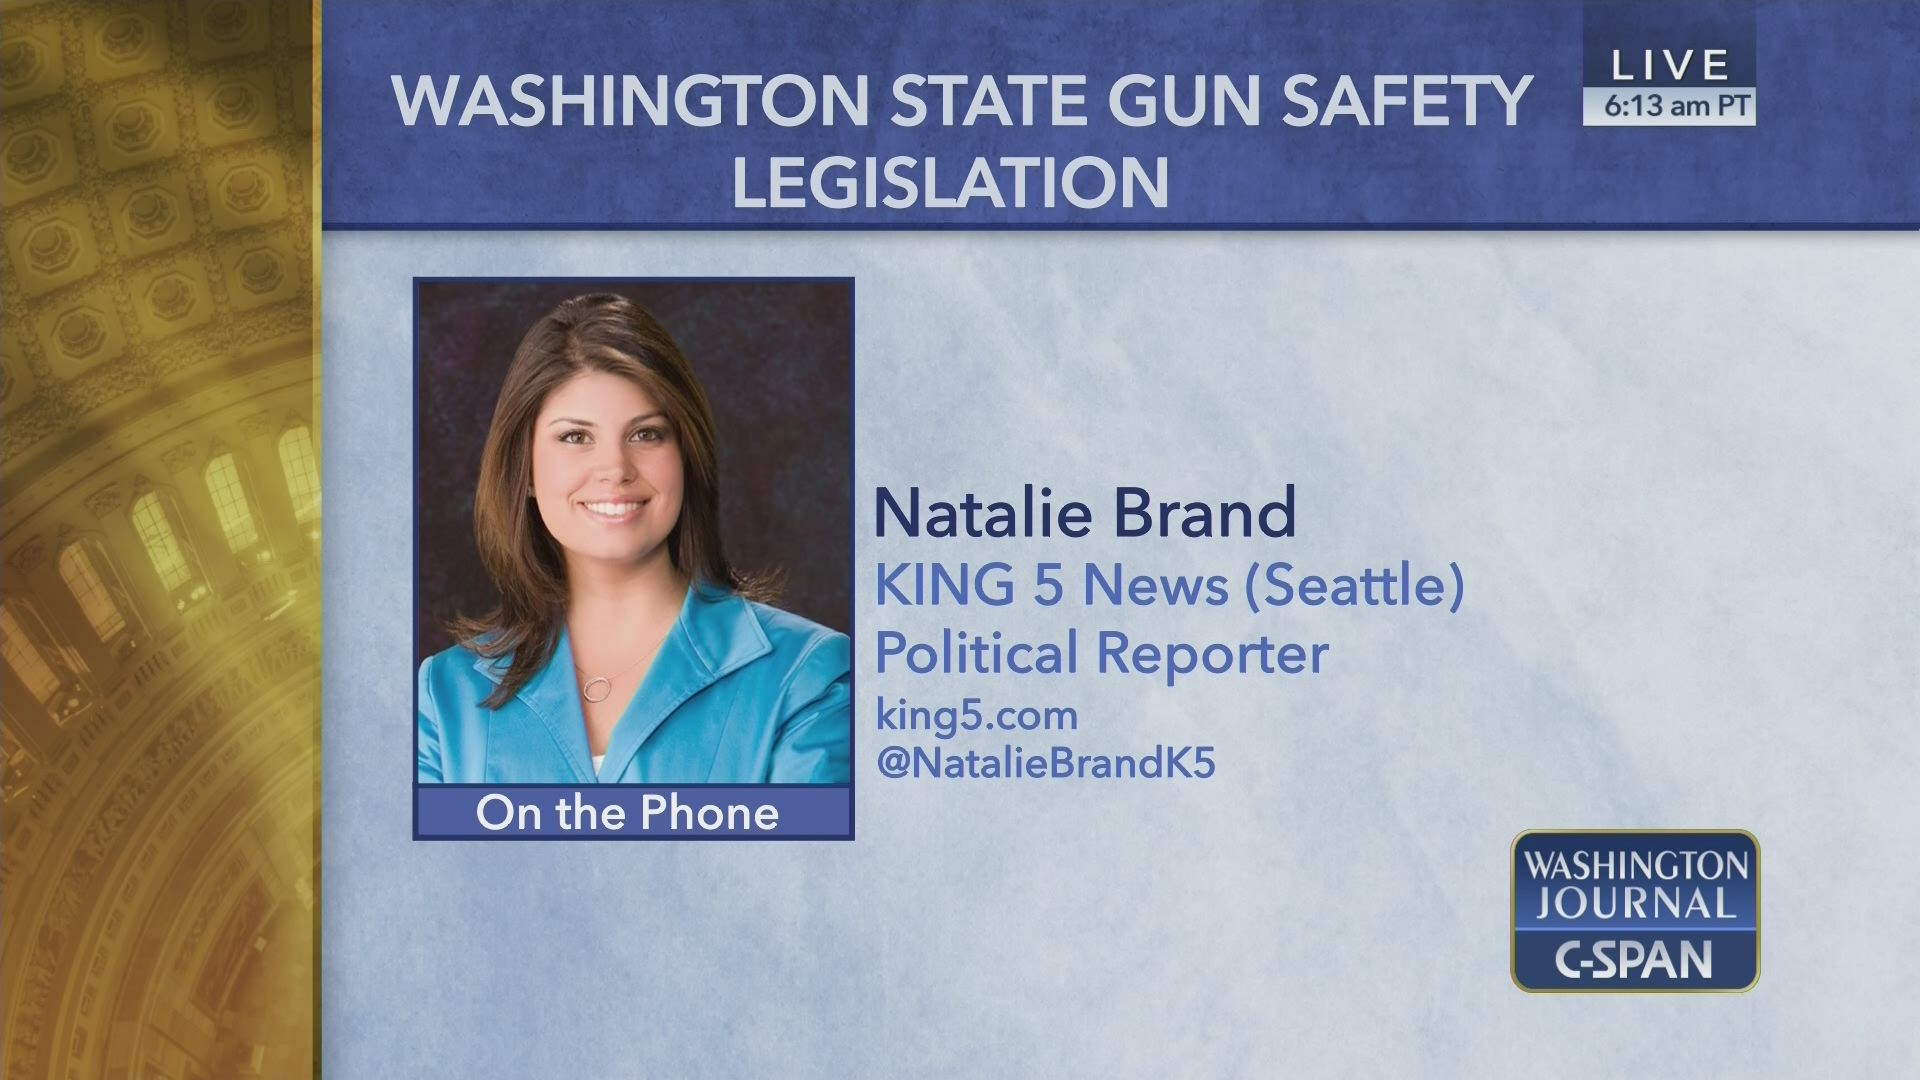 Natalie Brand on Washington State Gun Safety Legislation